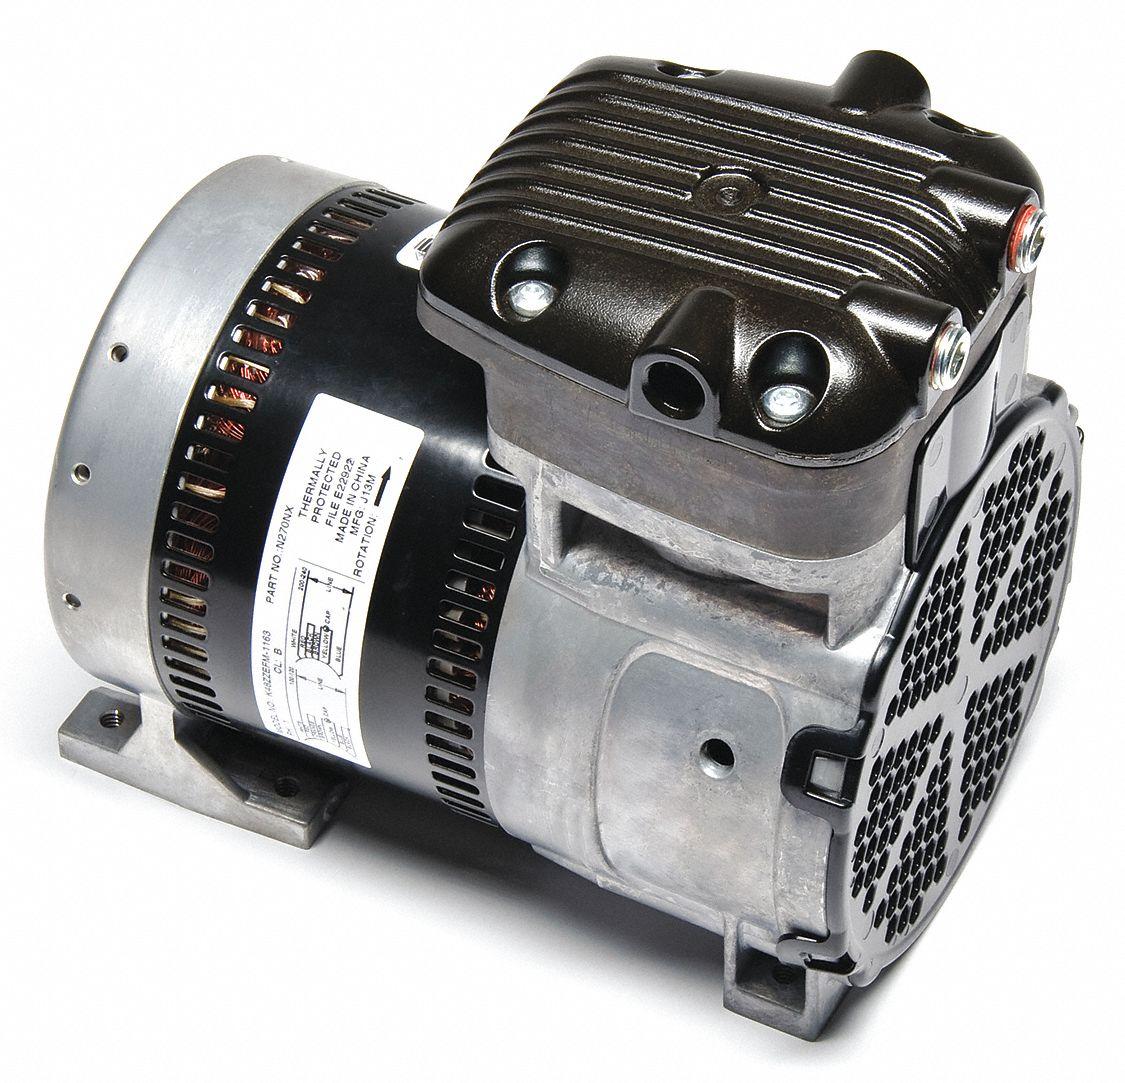 Gast 1 4 hp rocking piston air compressor 100 120 200 for Gast air motor distributors